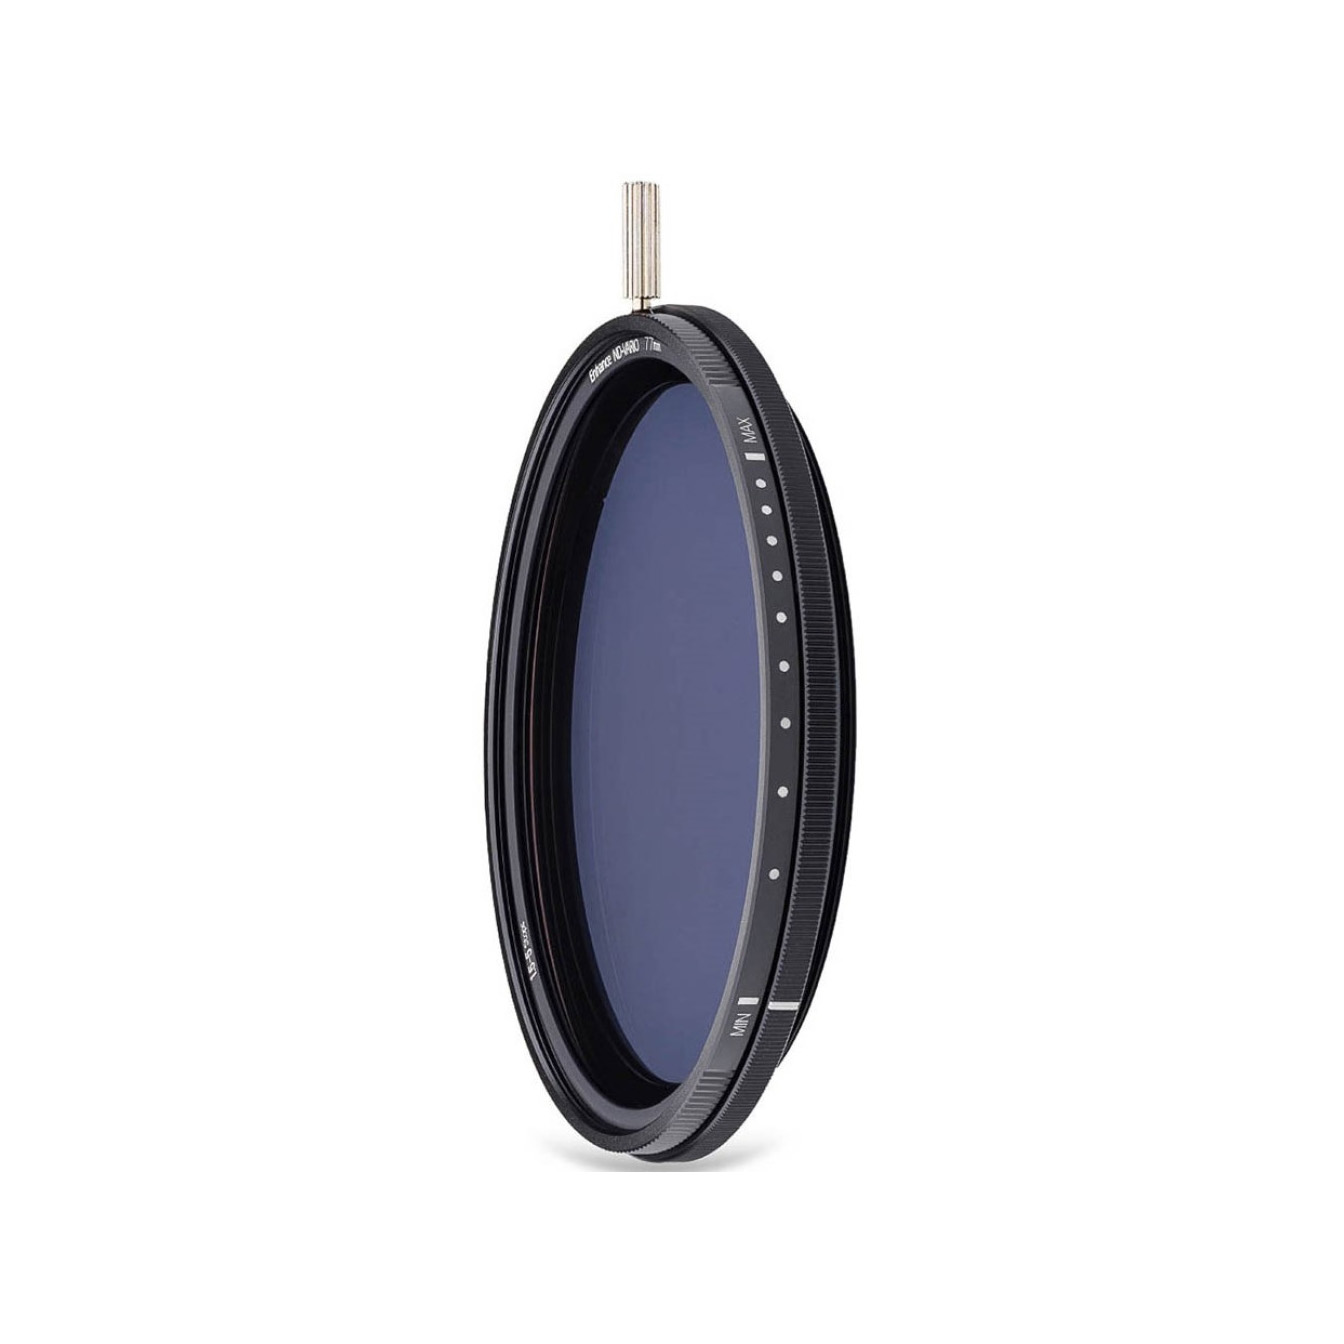 فیلتر ND متغیر NiSi Pro Nano 1.5-5 Stop Enhance ND-VARIO 77mm